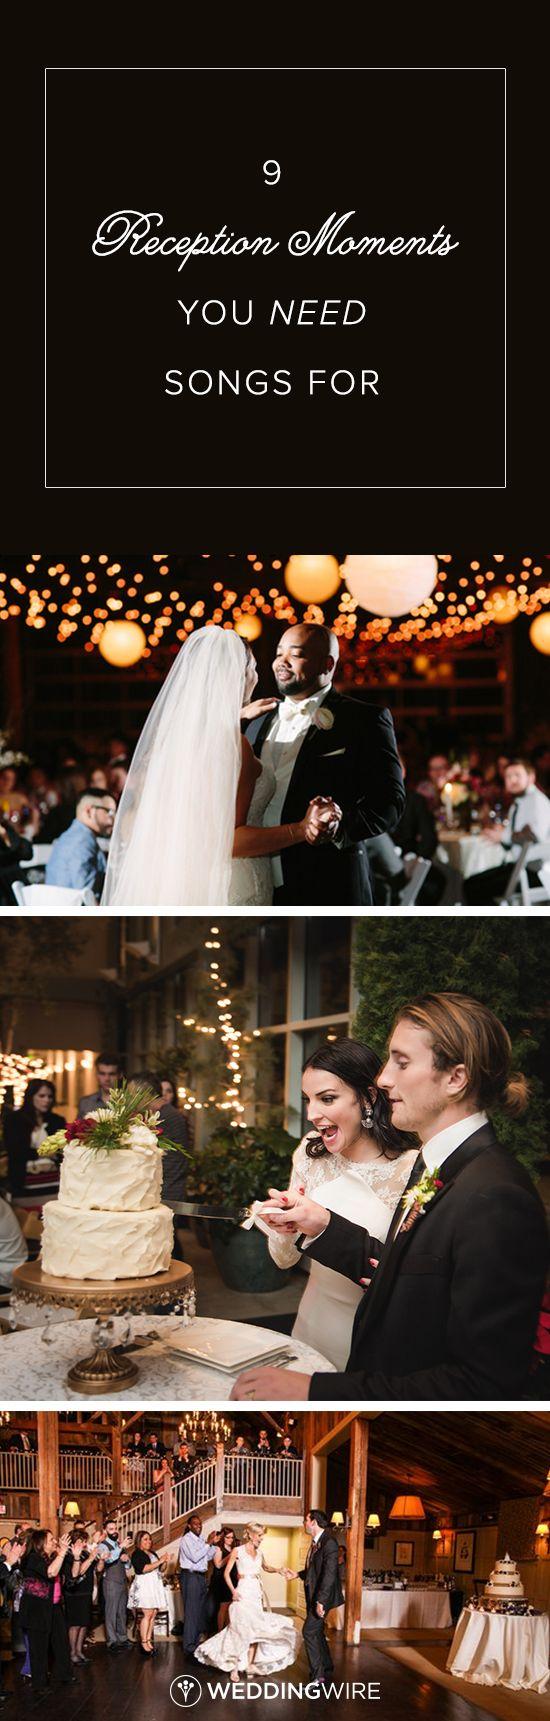 Best 25 Wedding songs reception ideas on Pinterest  Wedding reception playlist Wedding